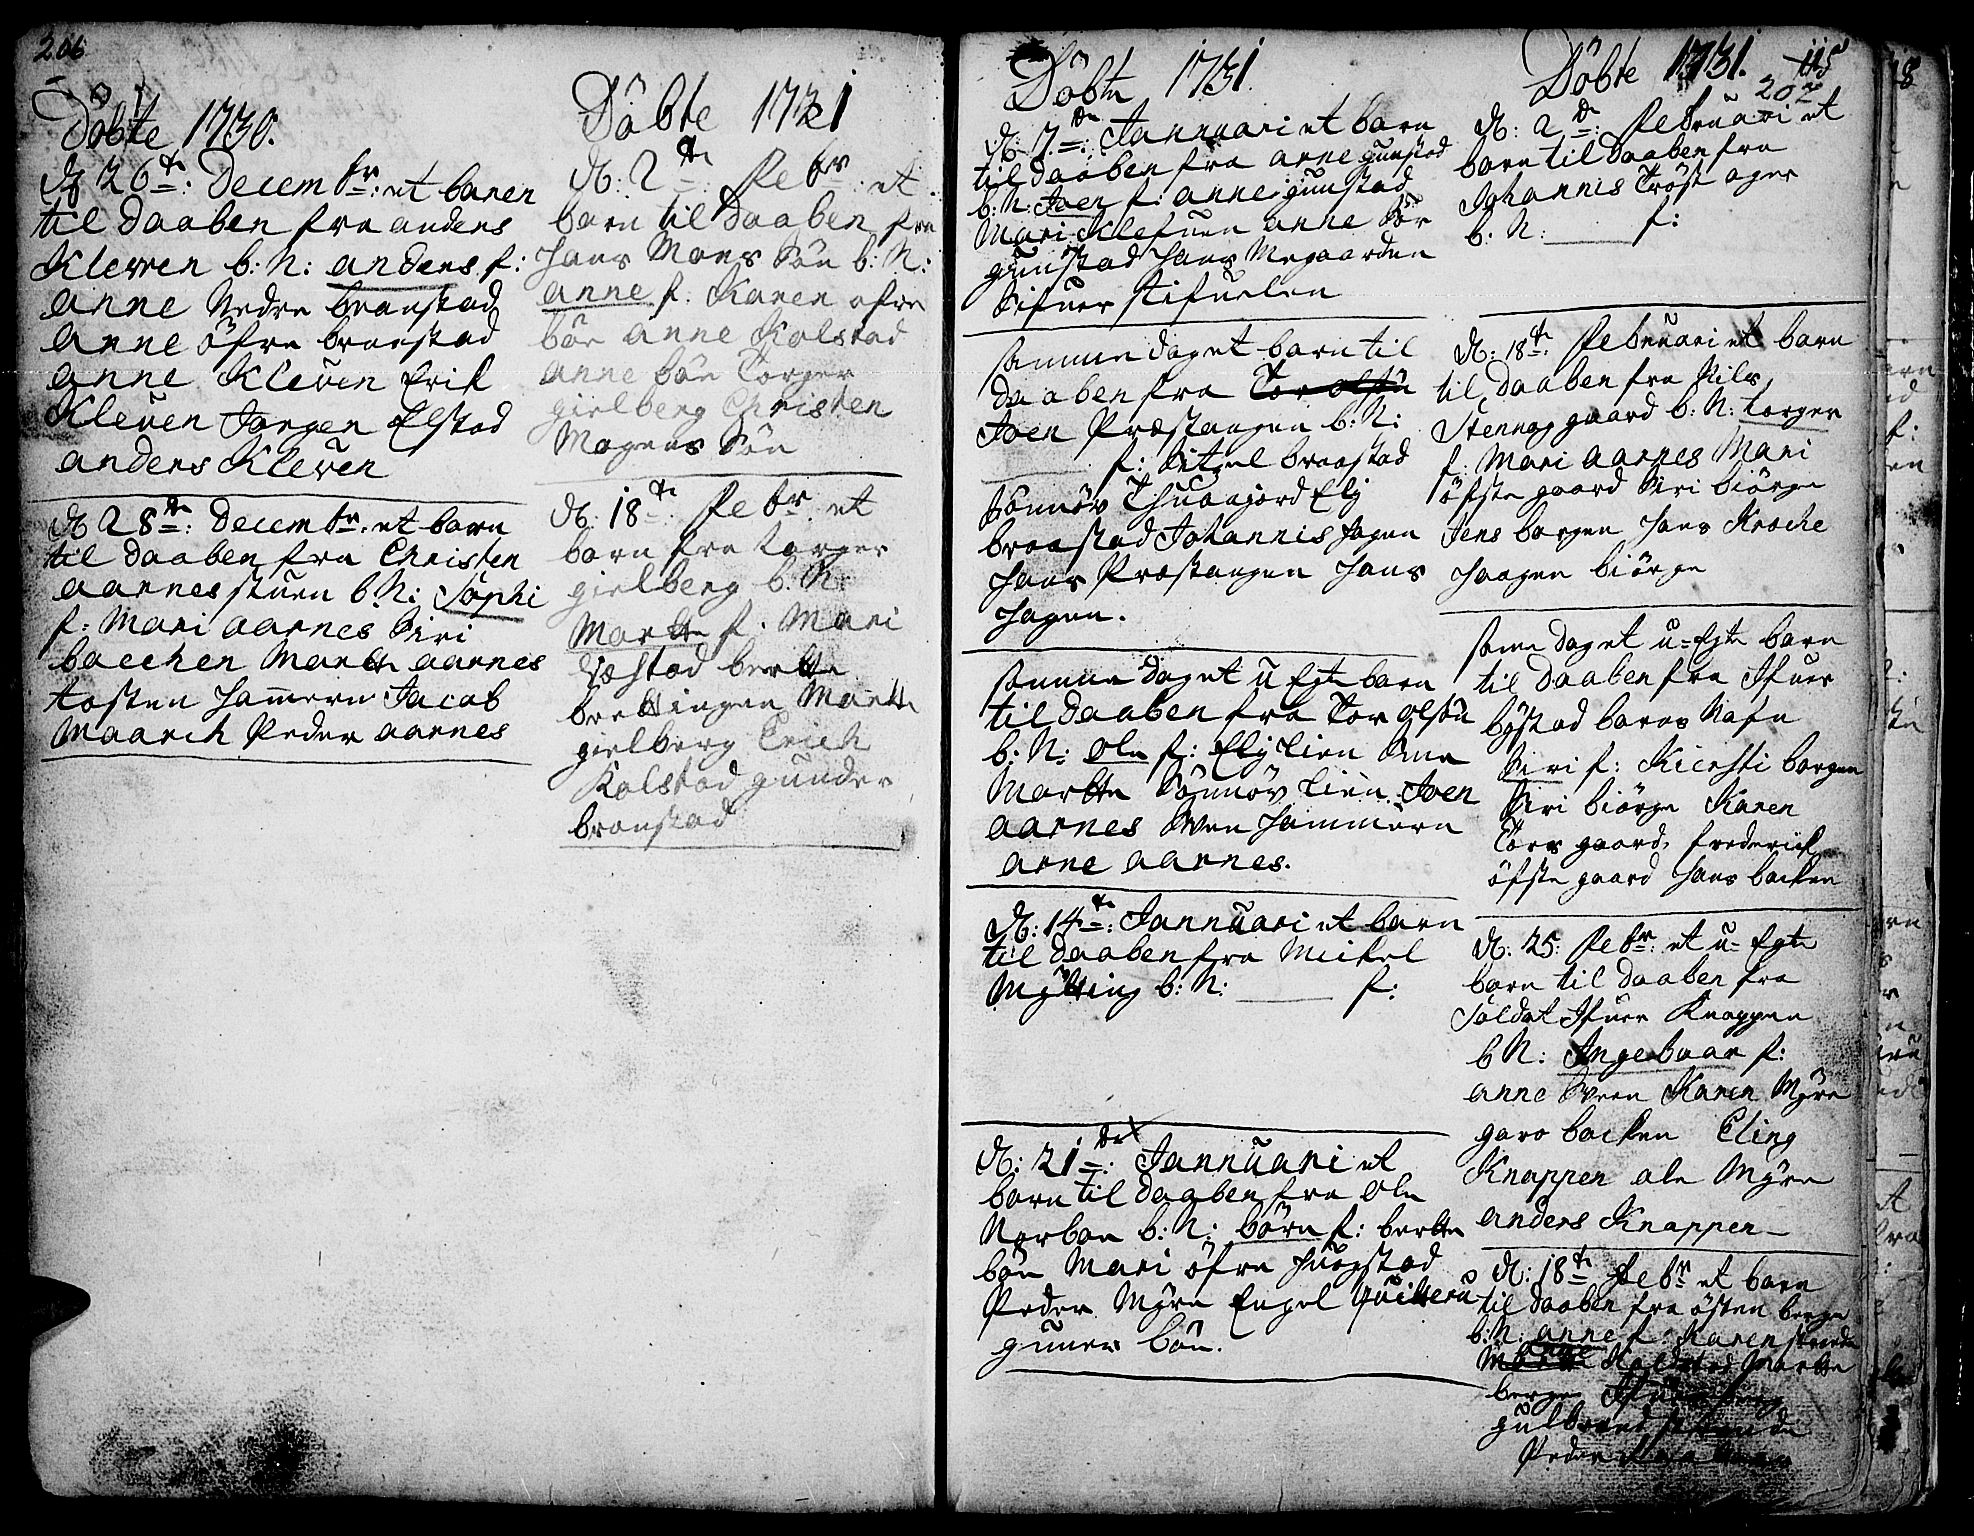 SAH, Ringebu prestekontor, Ministerialbok nr. 1, 1696-1733, s. 206-207